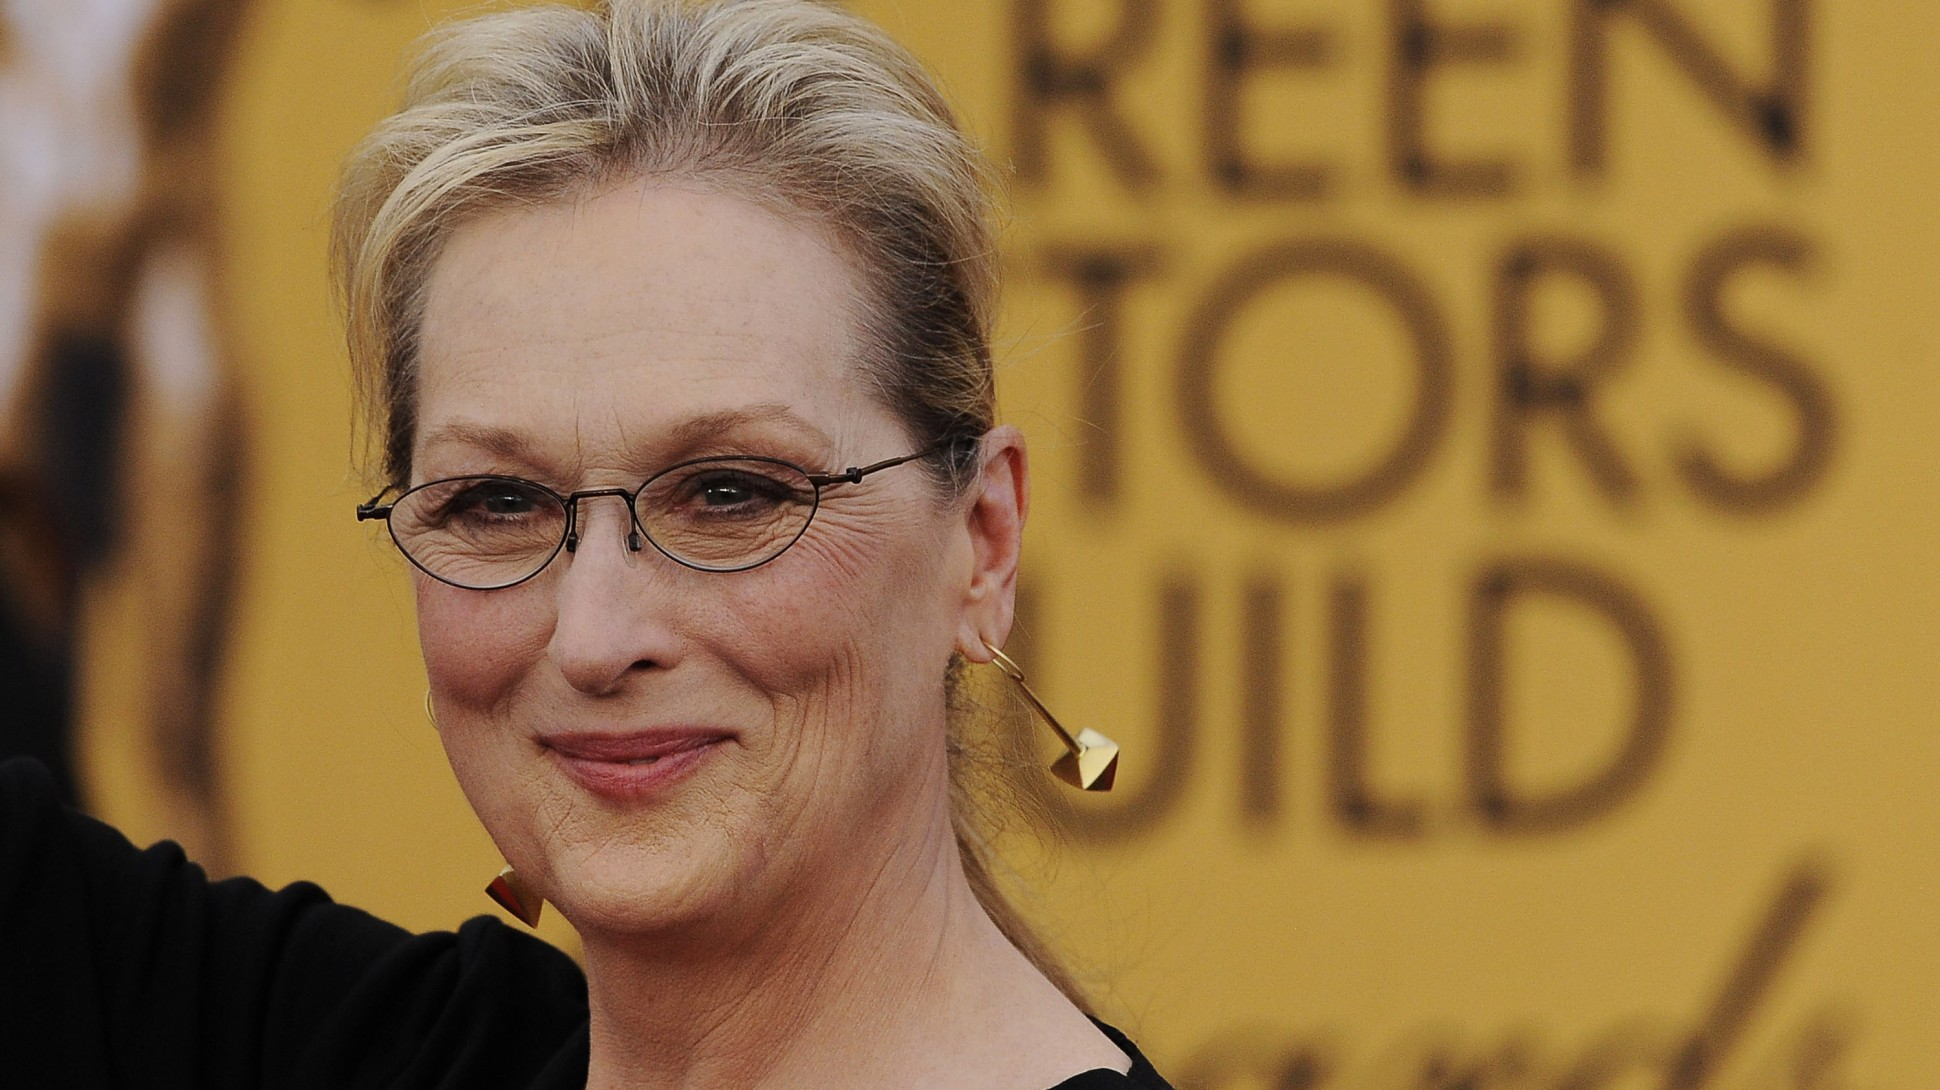 Meryl Streep High Definition Wallpapers